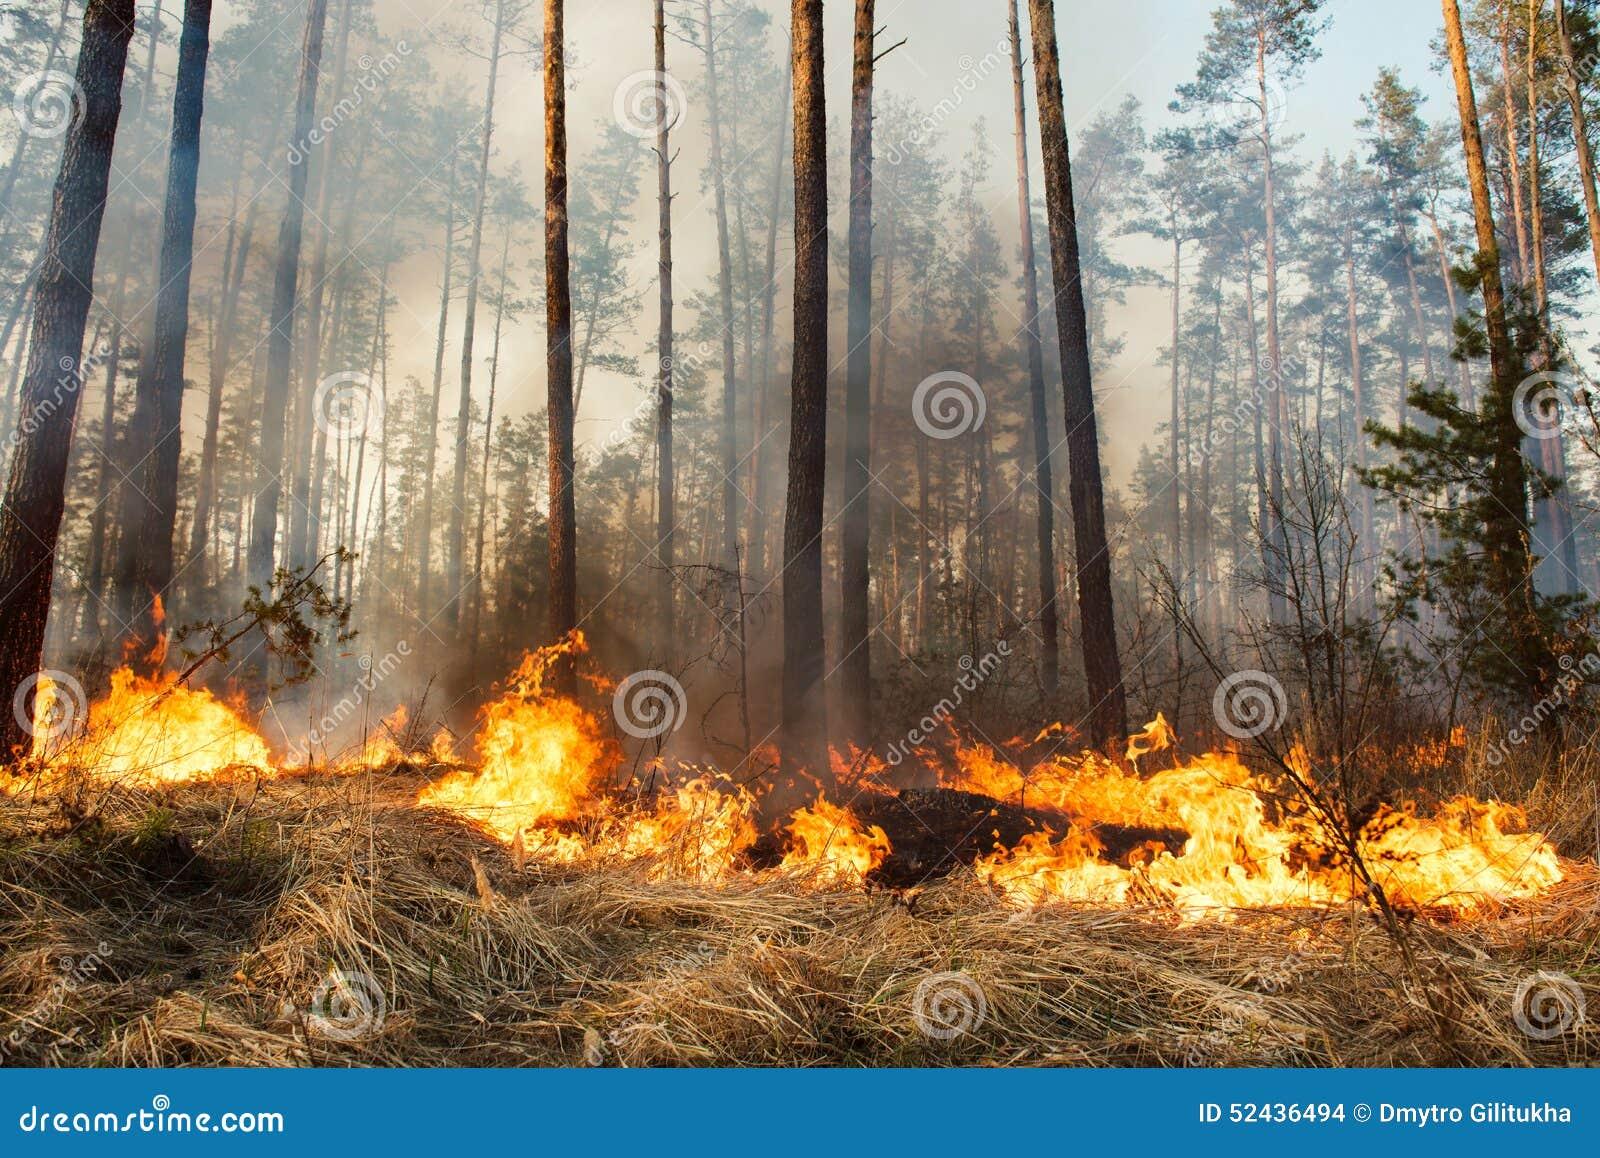 Pågående skogsbrand